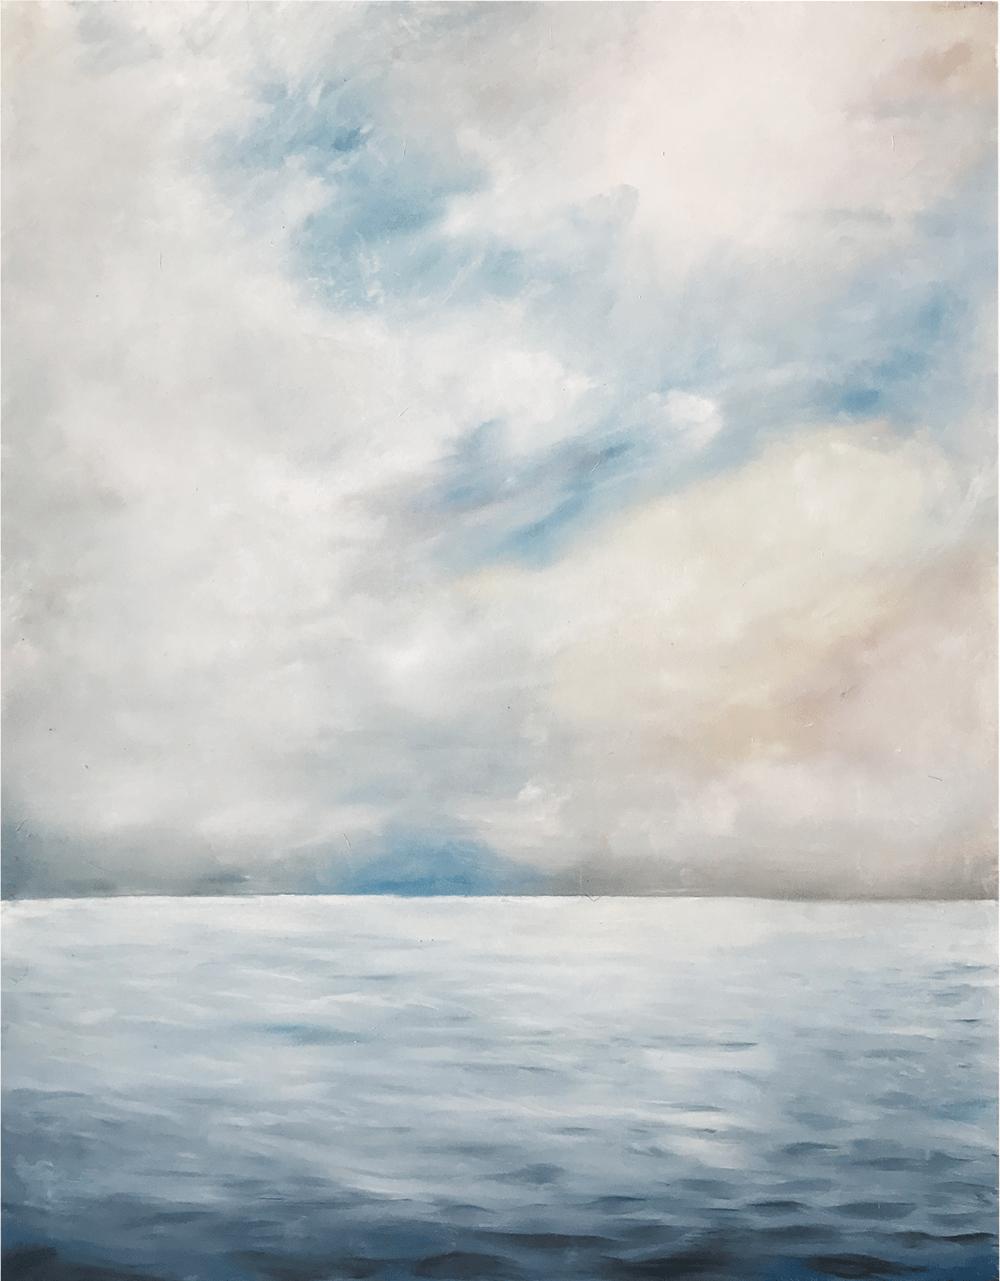 Image of Water No. 11